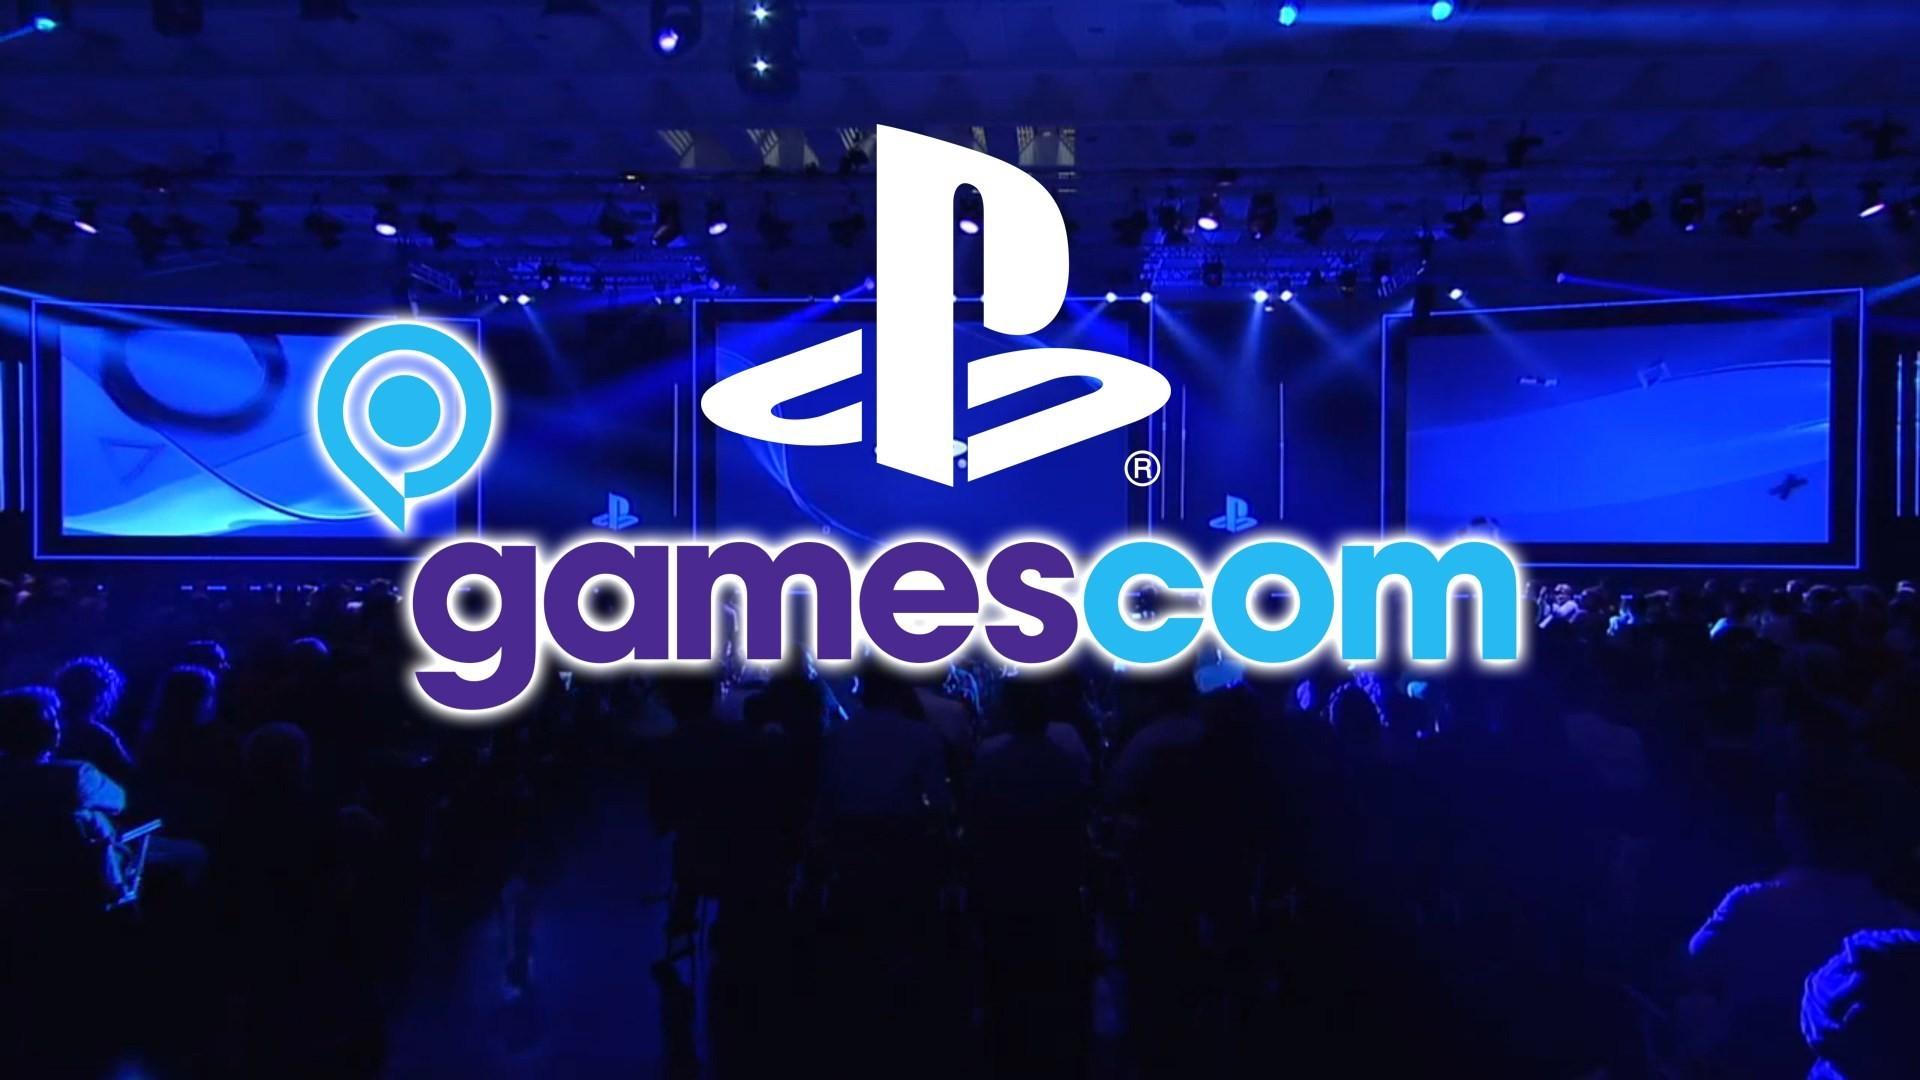 Gamescom streaming giochi